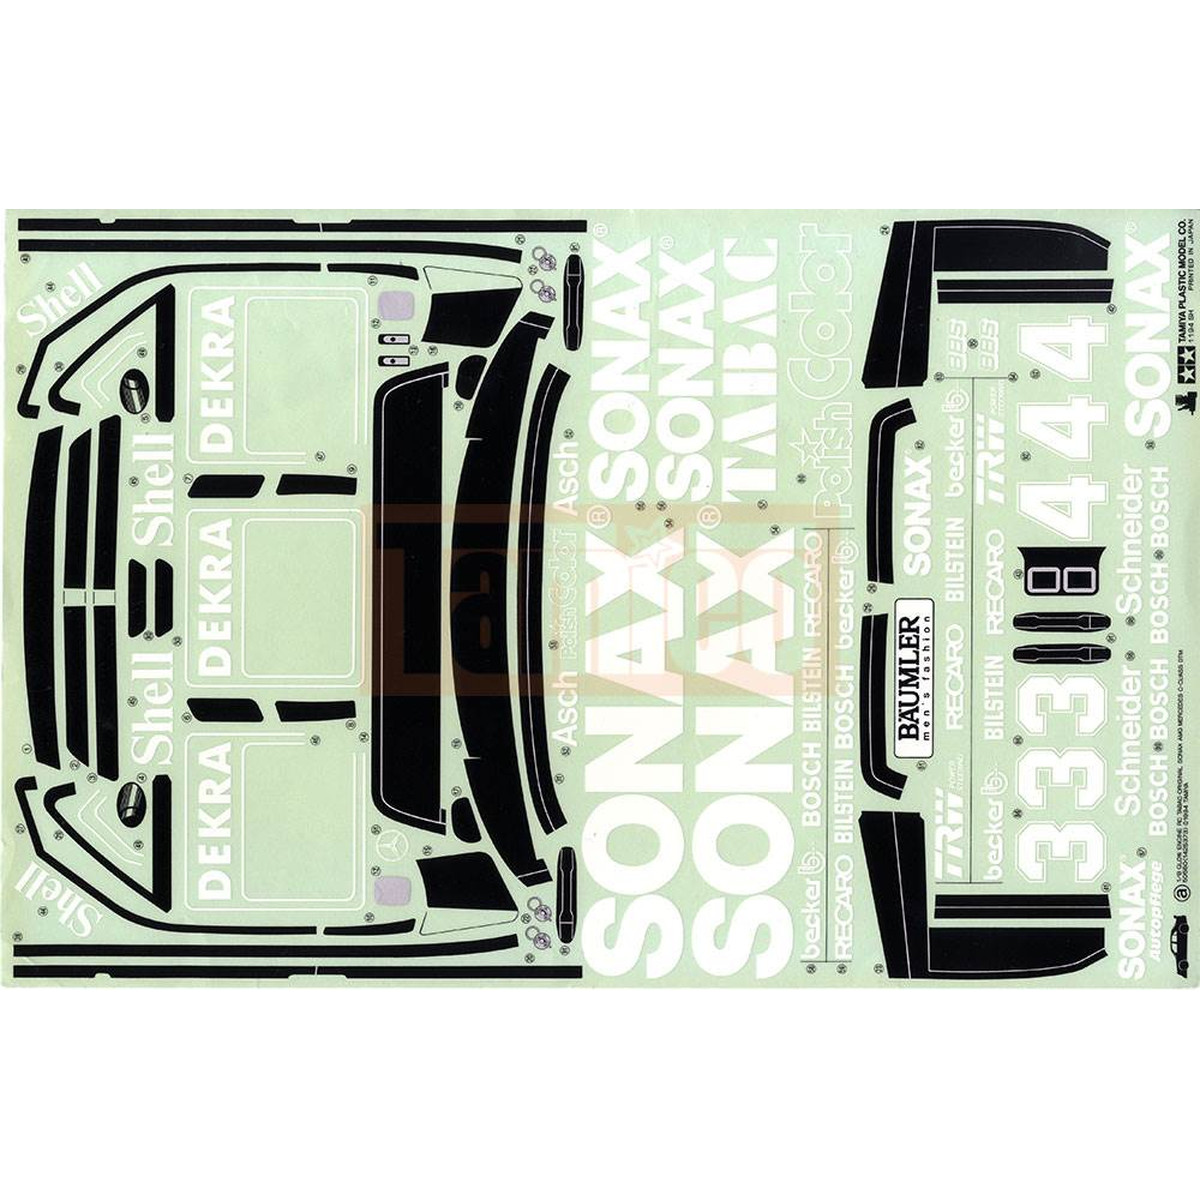 Tamiya Aufkleber Amg Mercedes Benz Dtm Sonax 18 19495200